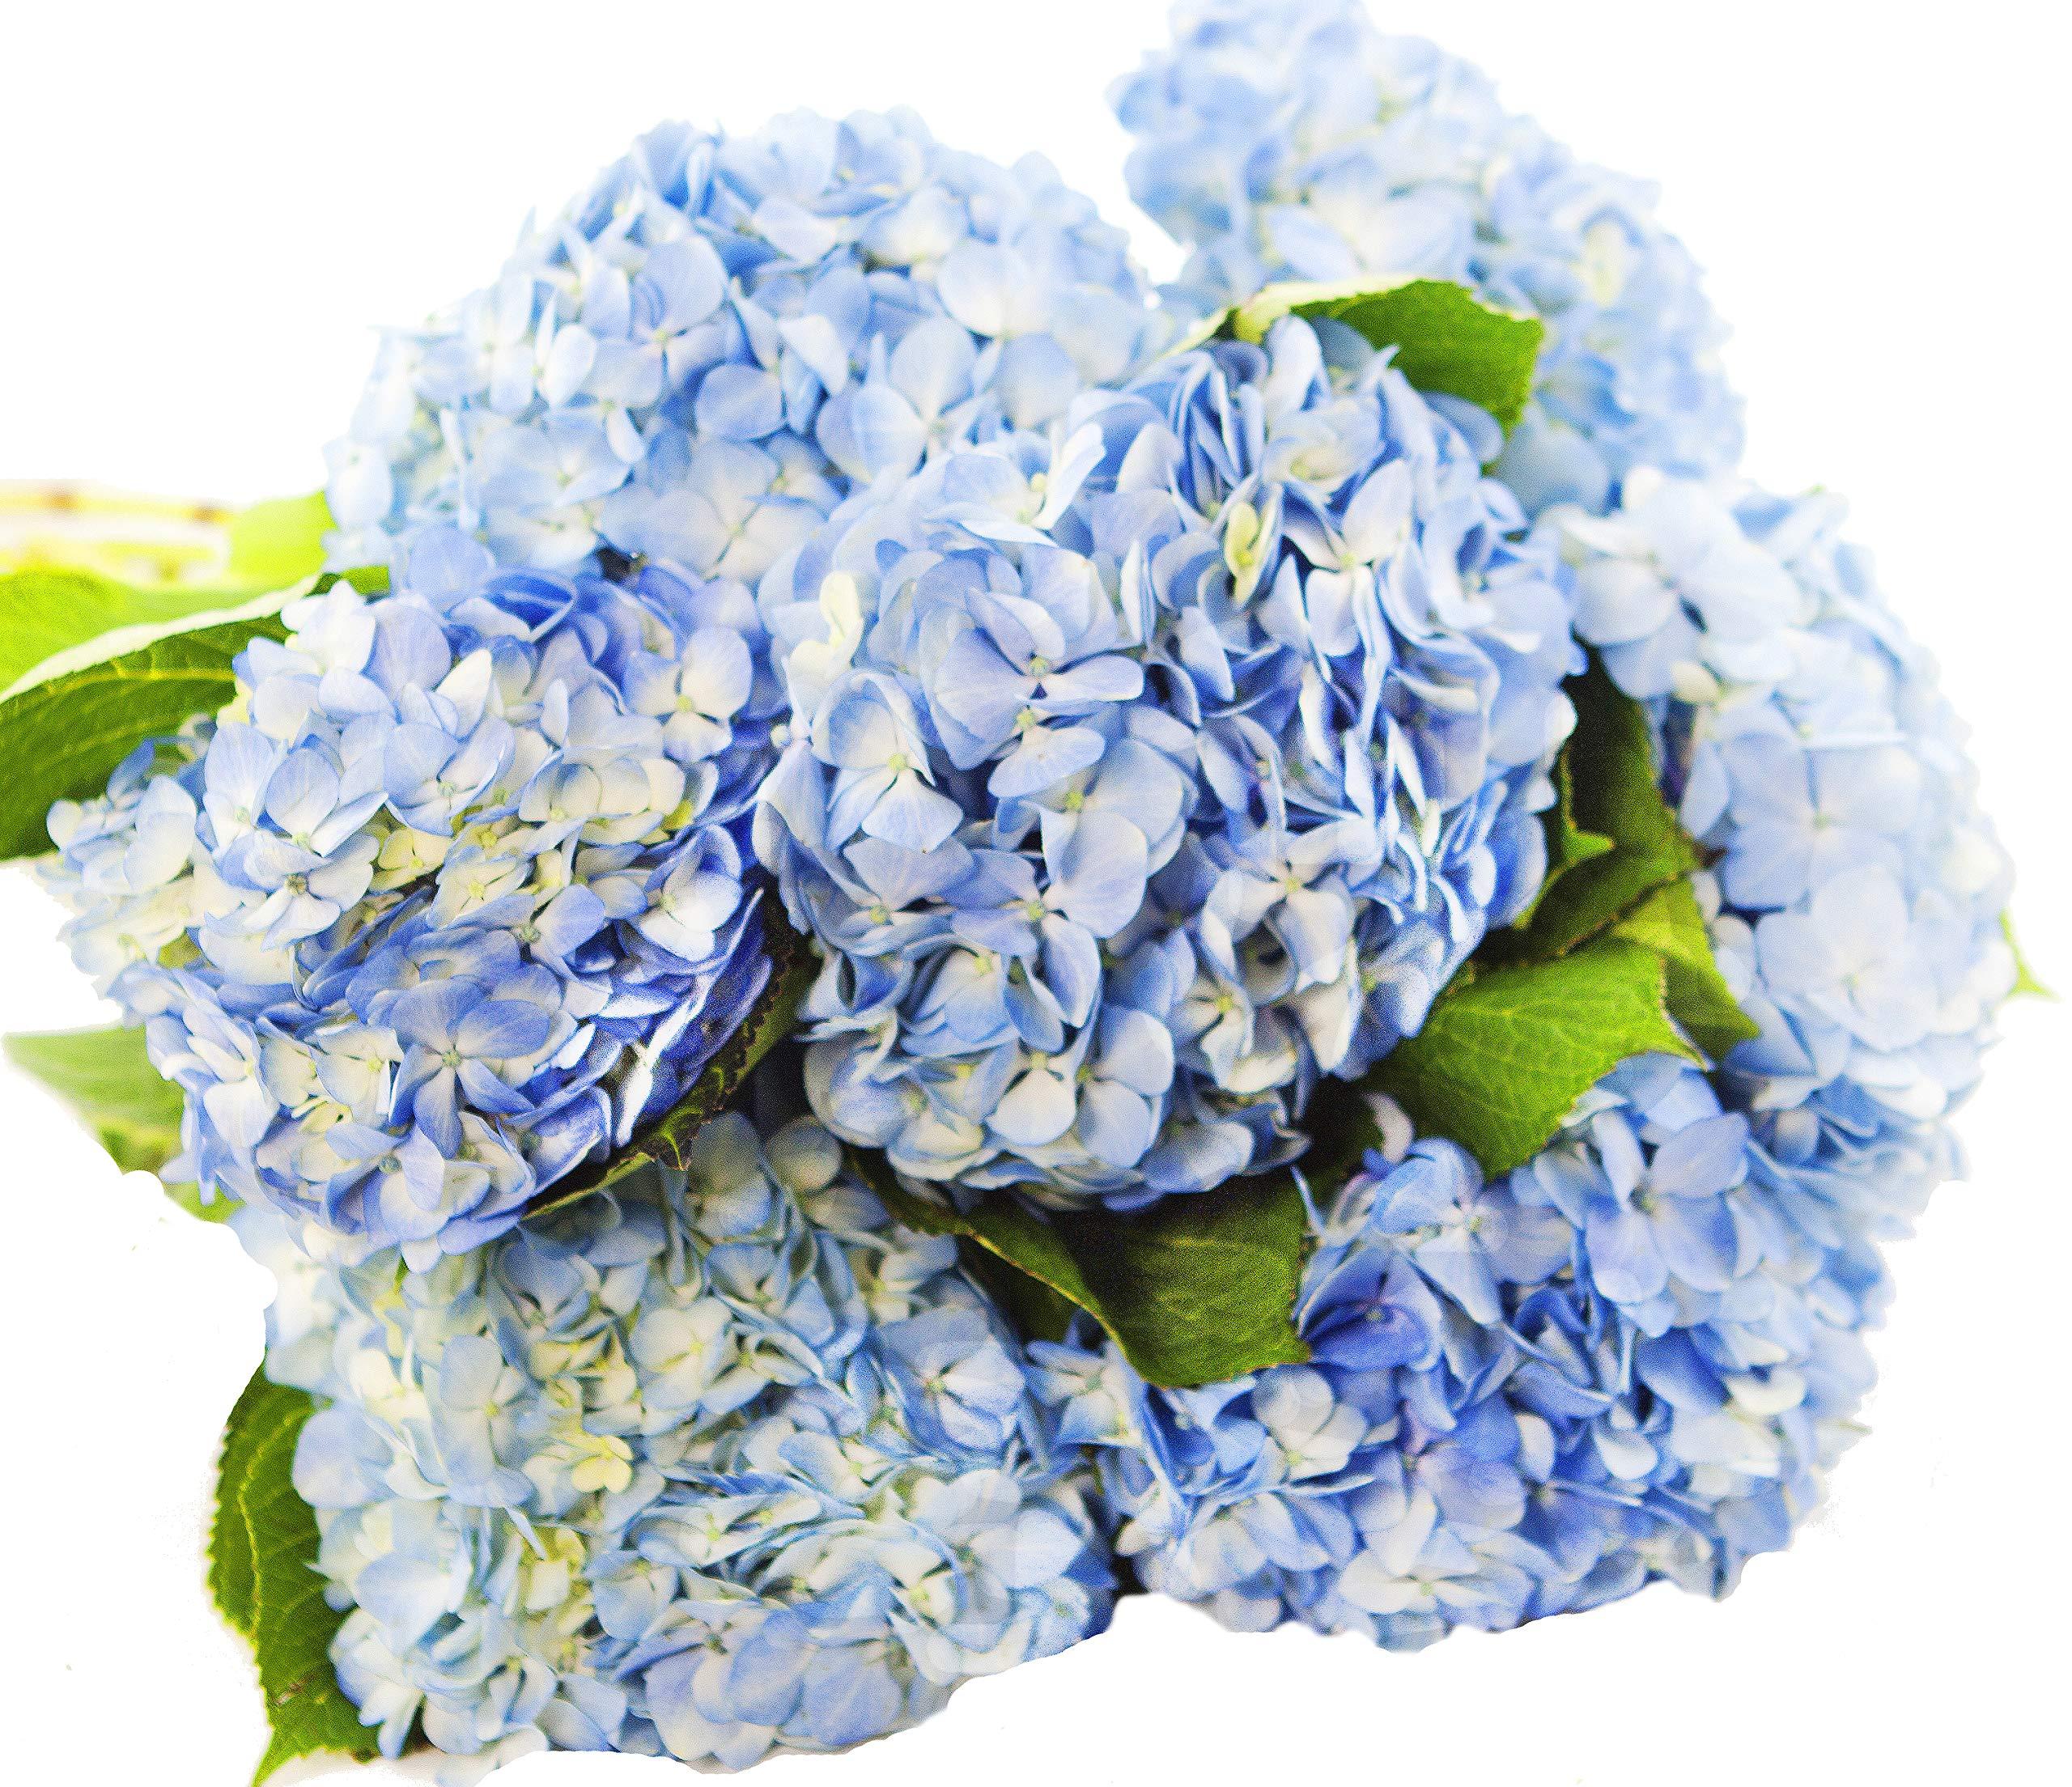 Blooms2Door 30 Blue Hydrangeas (Farm-Fresh, Naturally Colored, Premium Quality) by Blooms2Door (Image #5)